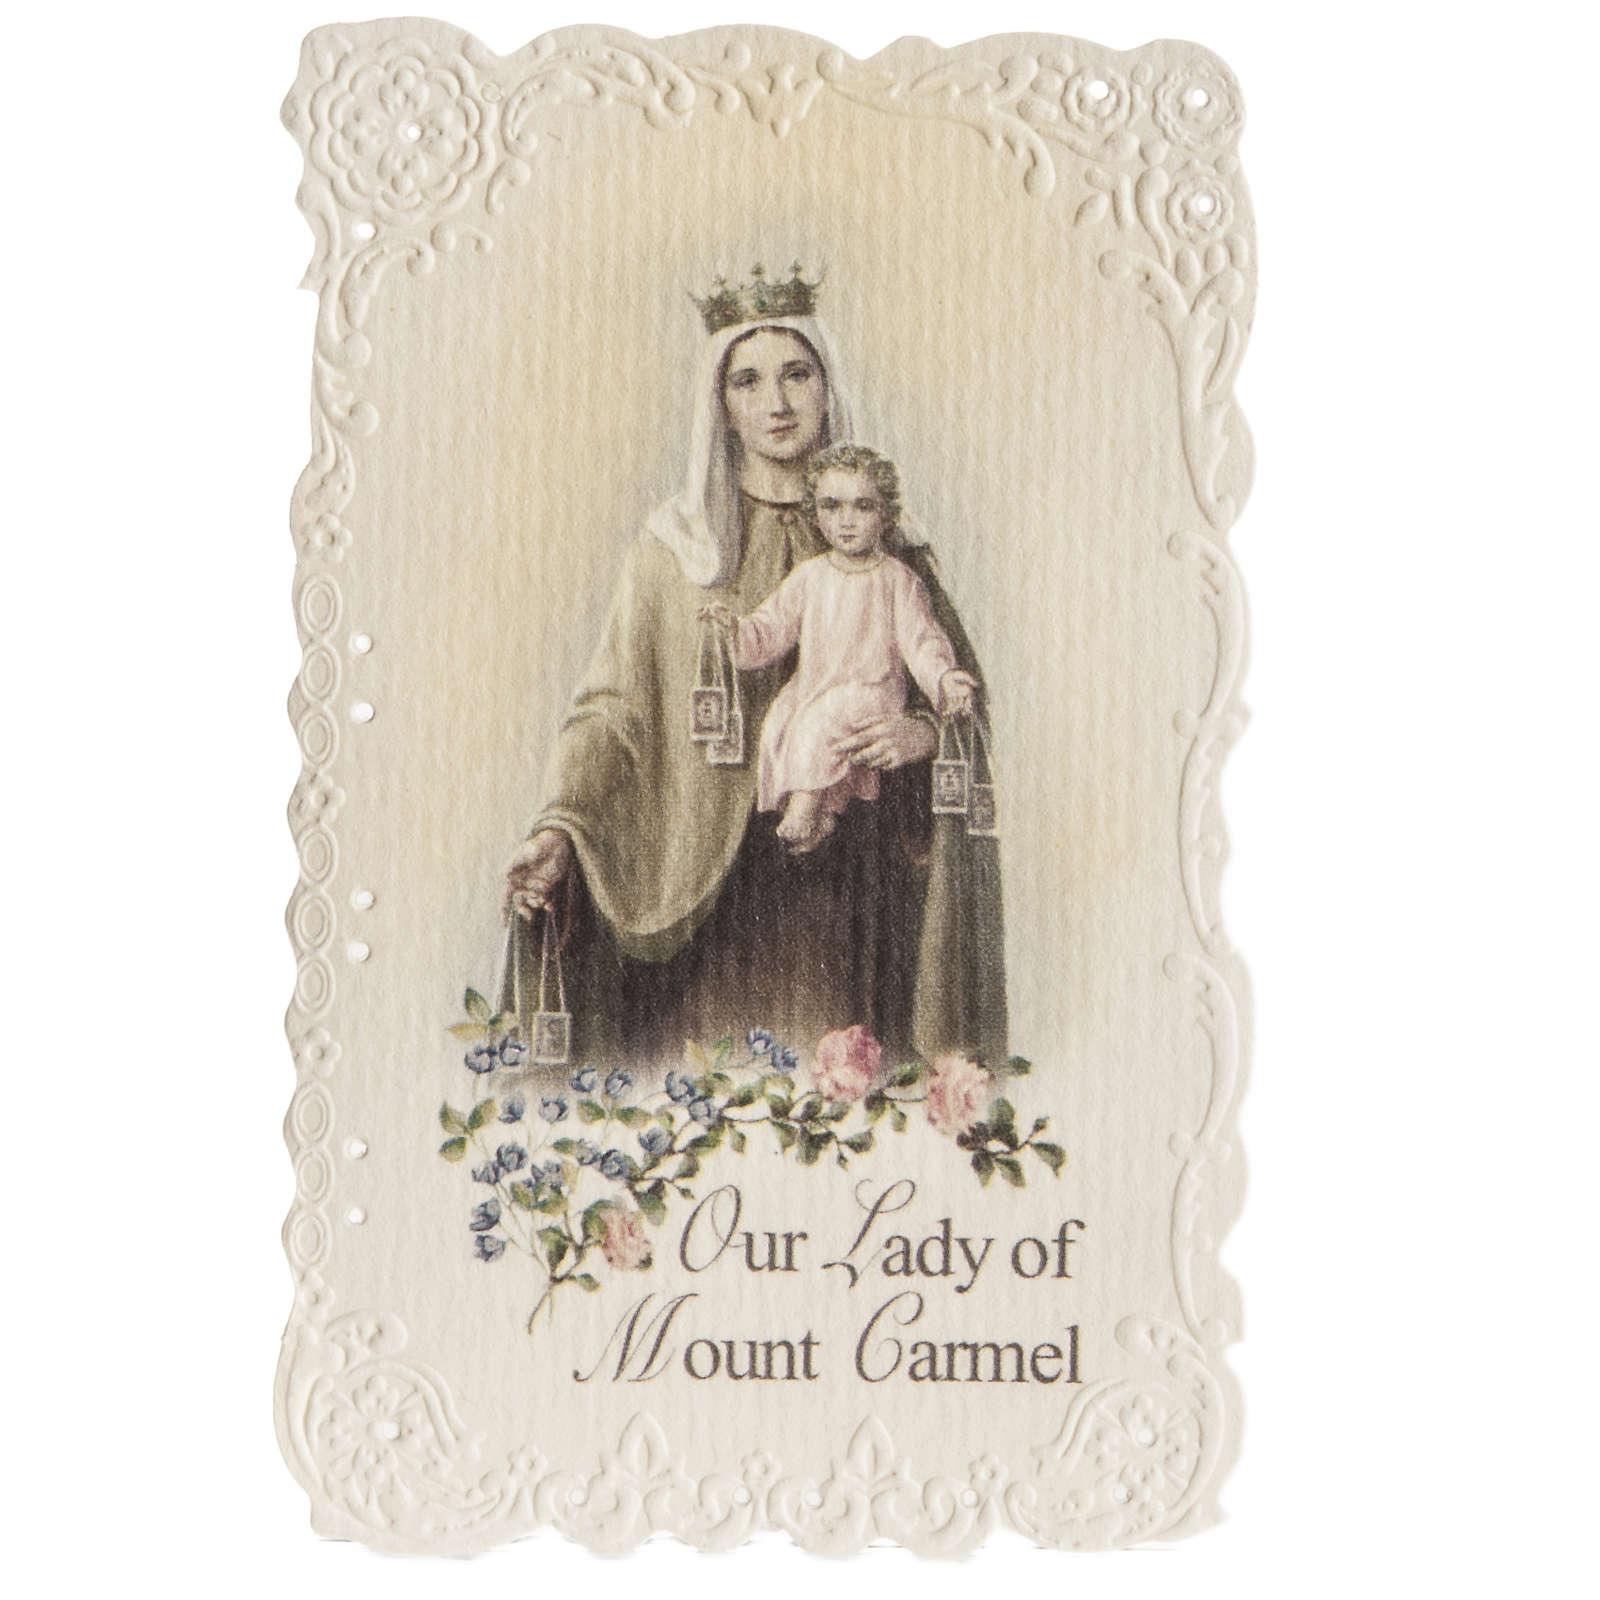 Santino Our Lady of Mount Carmel e preghiera (inglese) 4